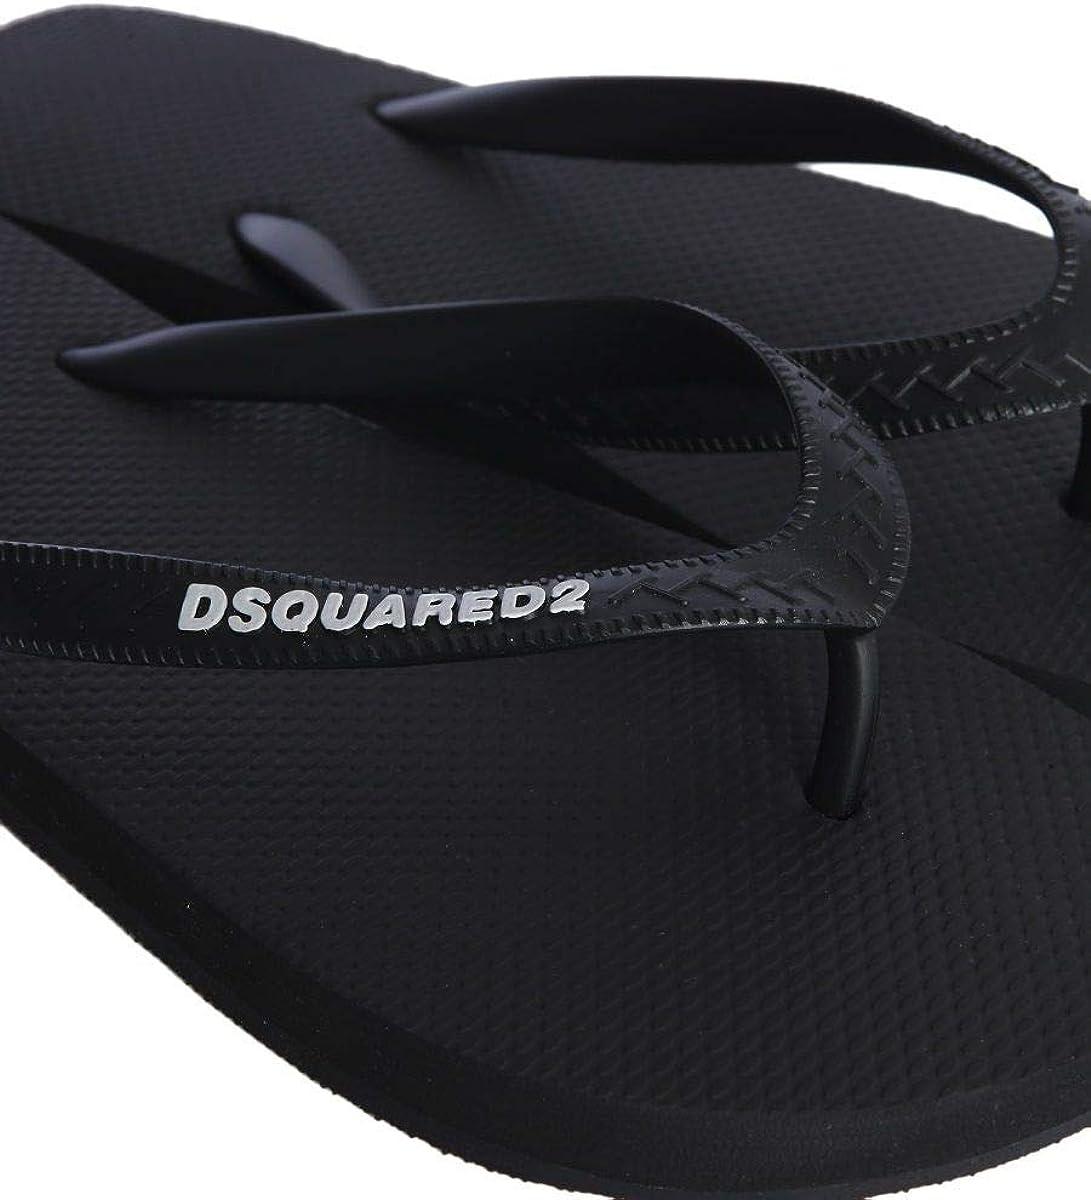 Spring Summer 20 DSQUARED2 Luxury Fashion Mens FFM0001172000012124 Black Flip Flops